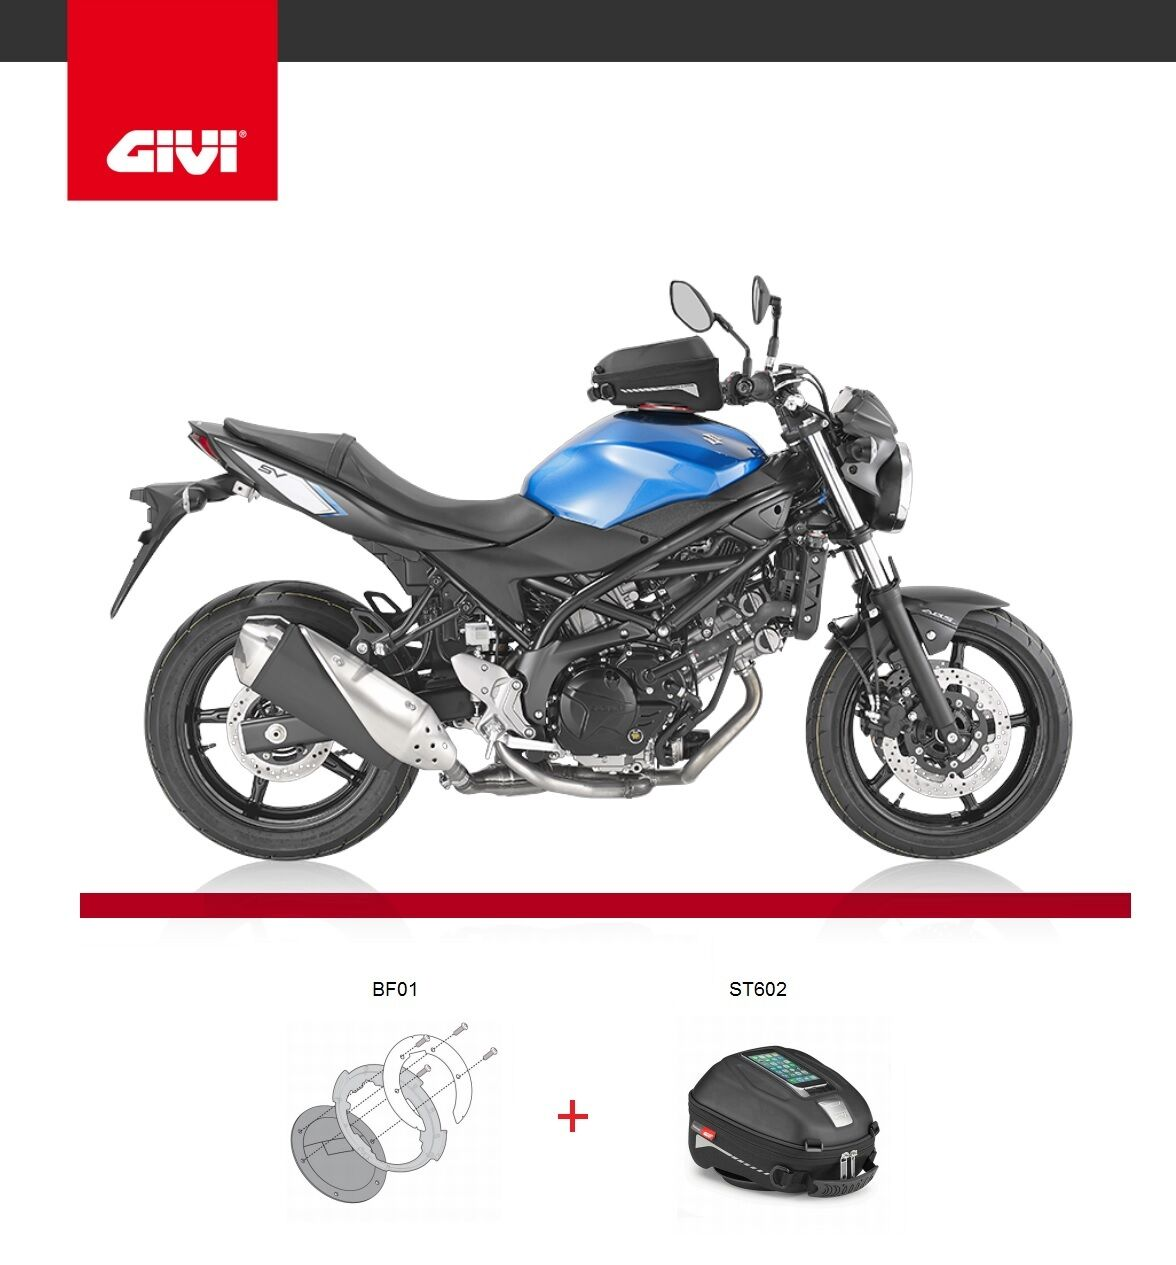 hight resolution of suzuki sv650 2016 tank bag givi st602 tanklock bag 4 litre bf01 fitting ring ebay